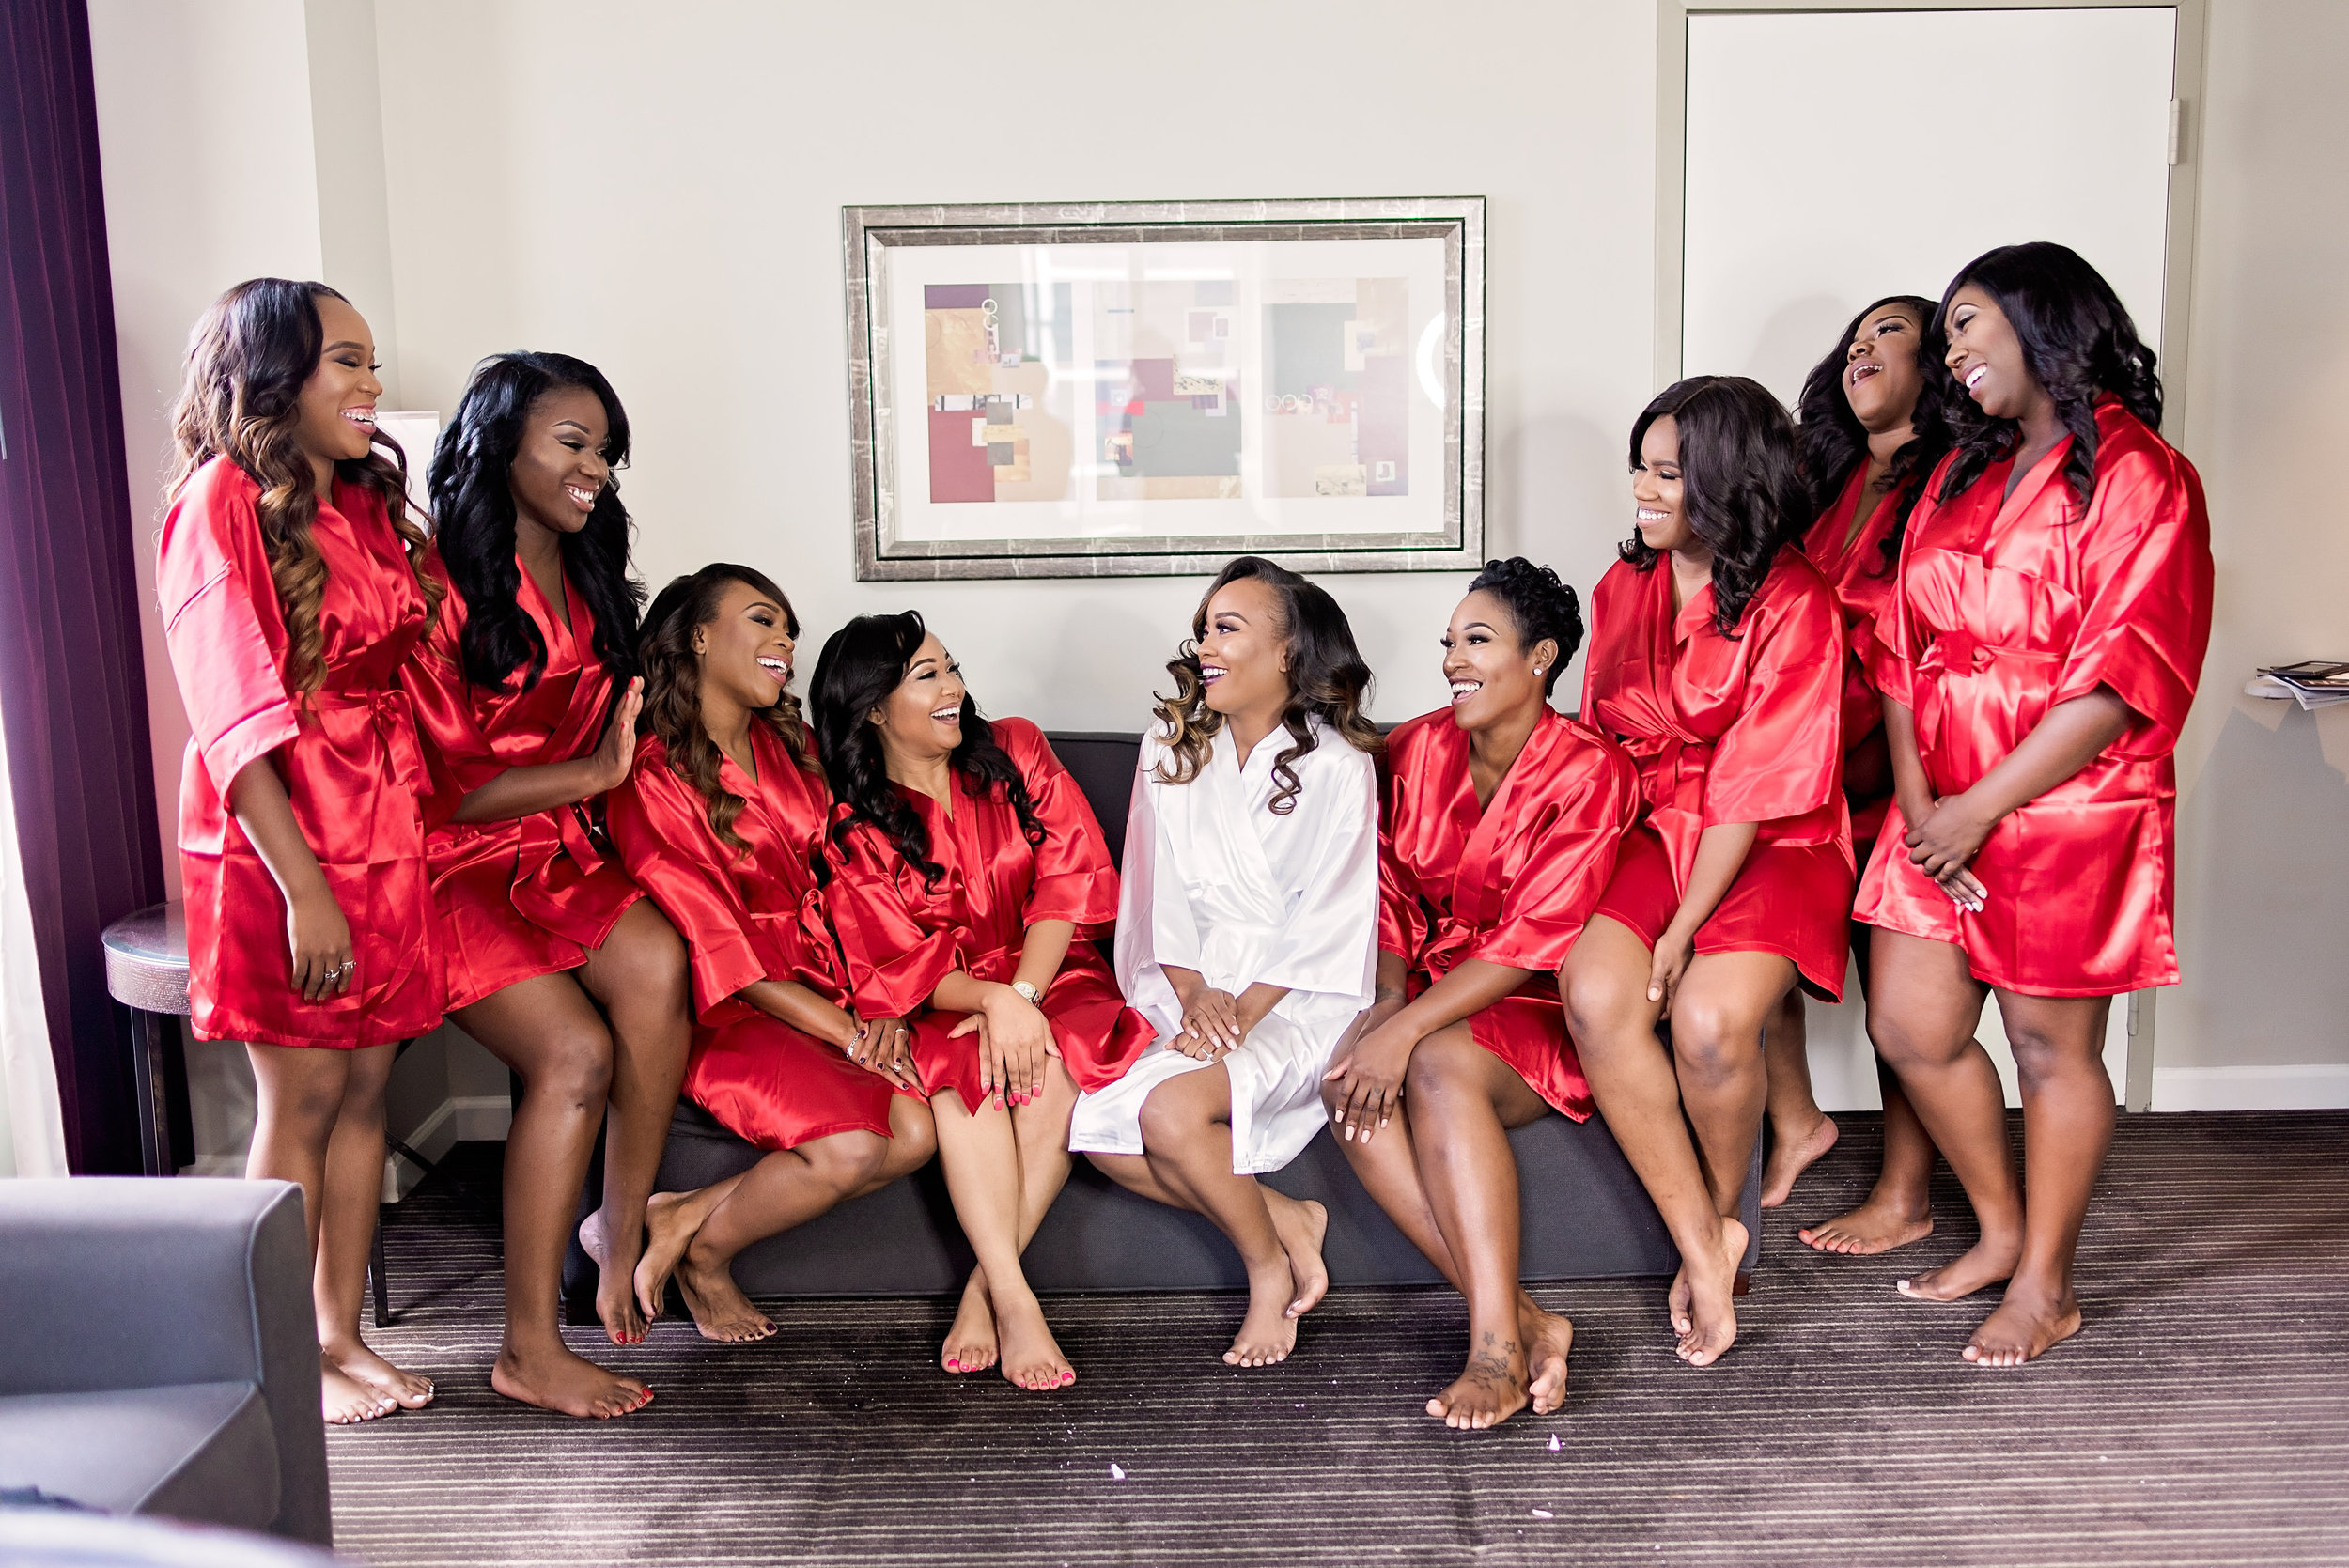 Houston Wedding- Texas Photography- Pharris Photography- Nkechi and Elyx- The Crystal Ballroom- Bridesmaids